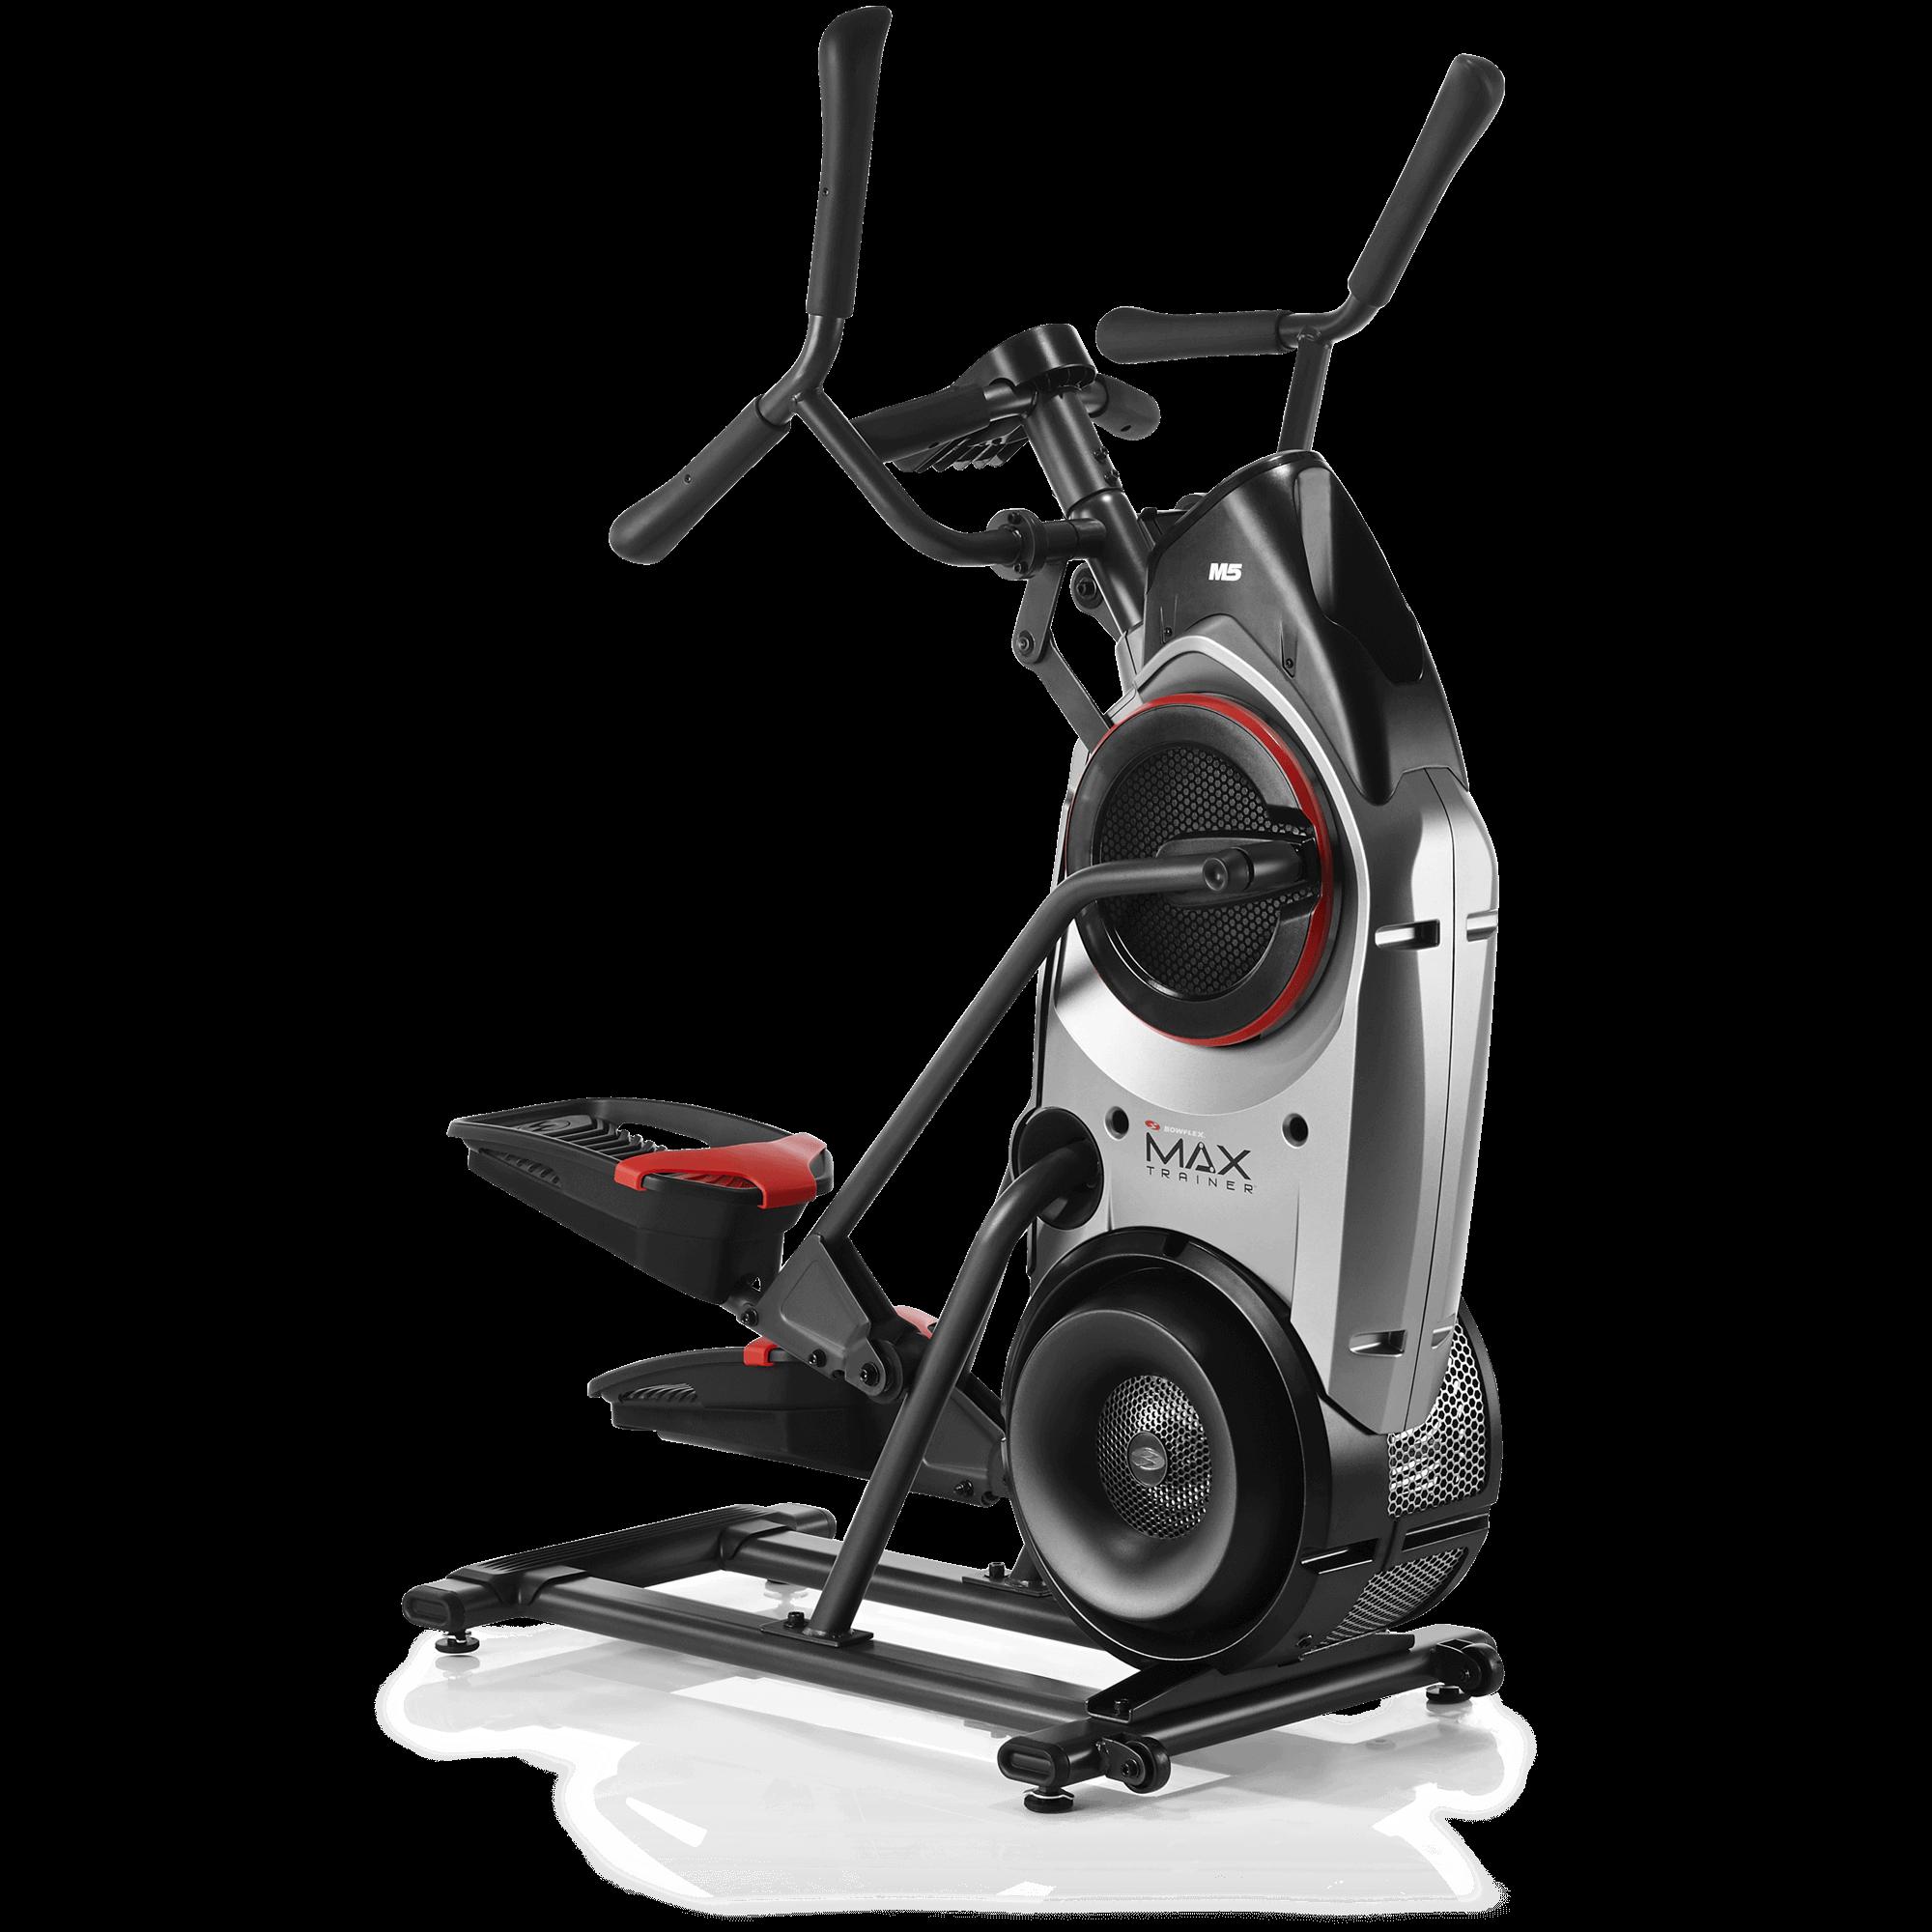 Bowflex Max Trainer M5 | Bowflex